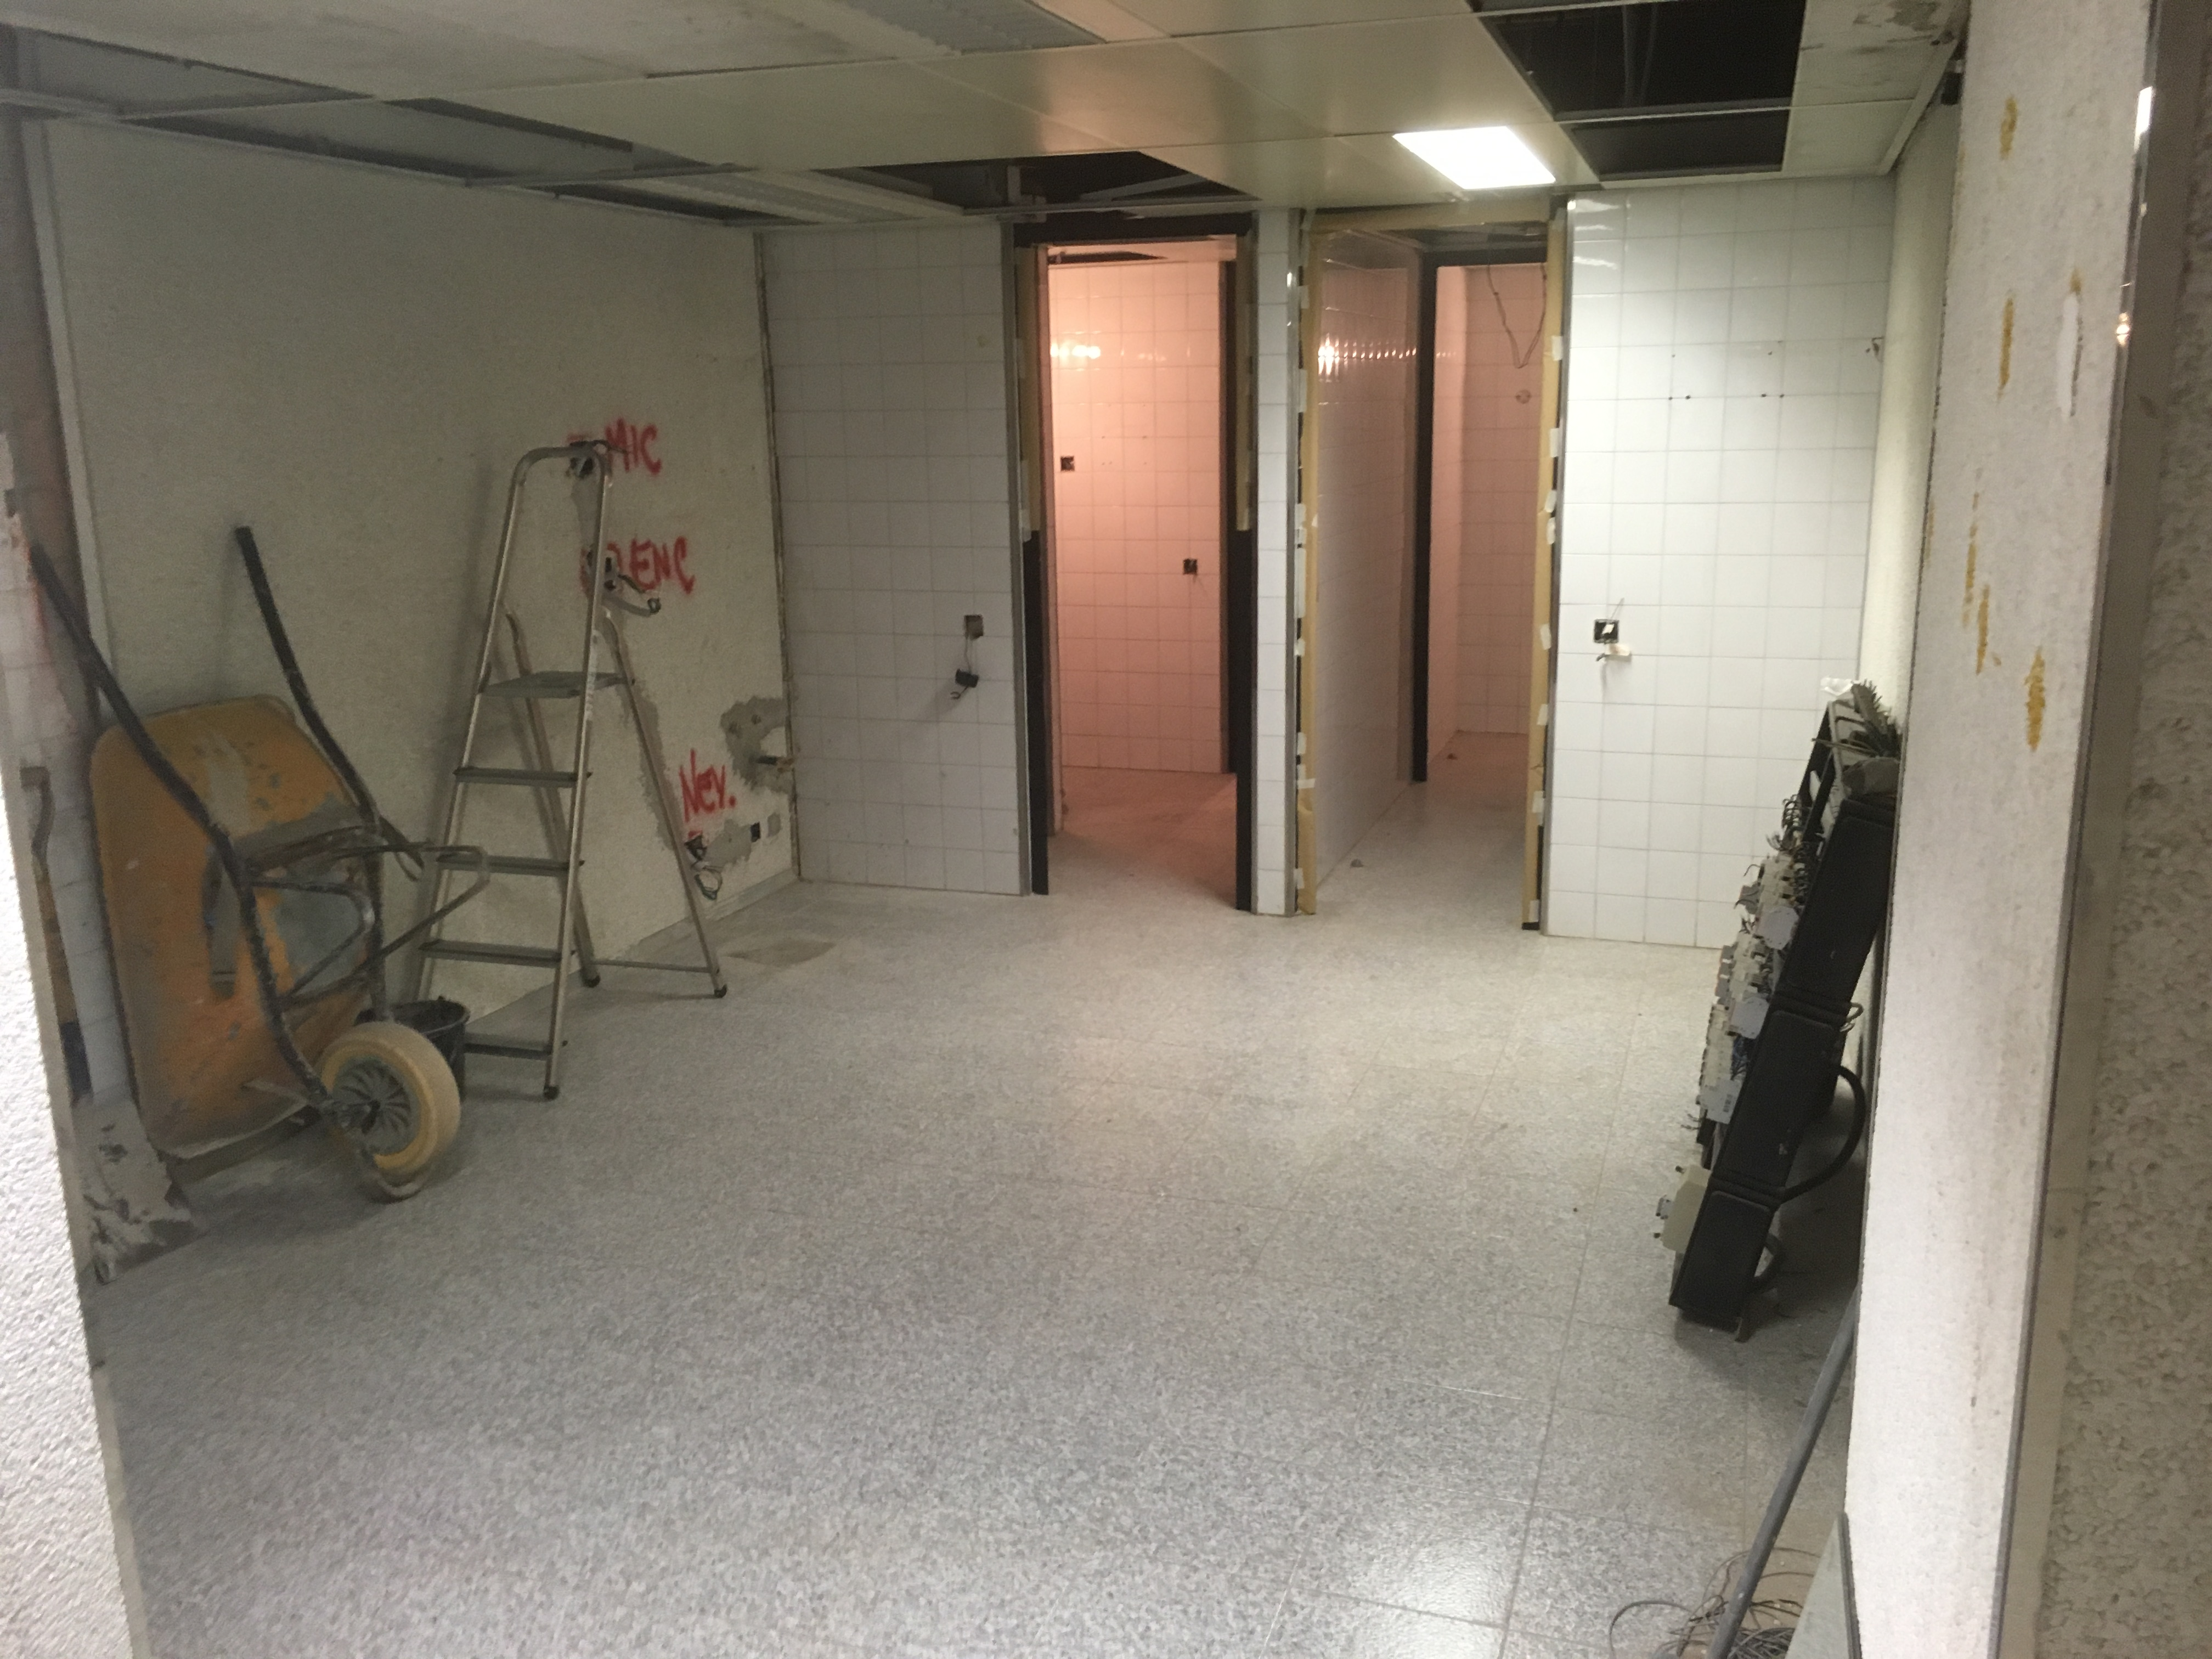 Reforma integral de local para oficina inmobiliaria mini cocina en obras